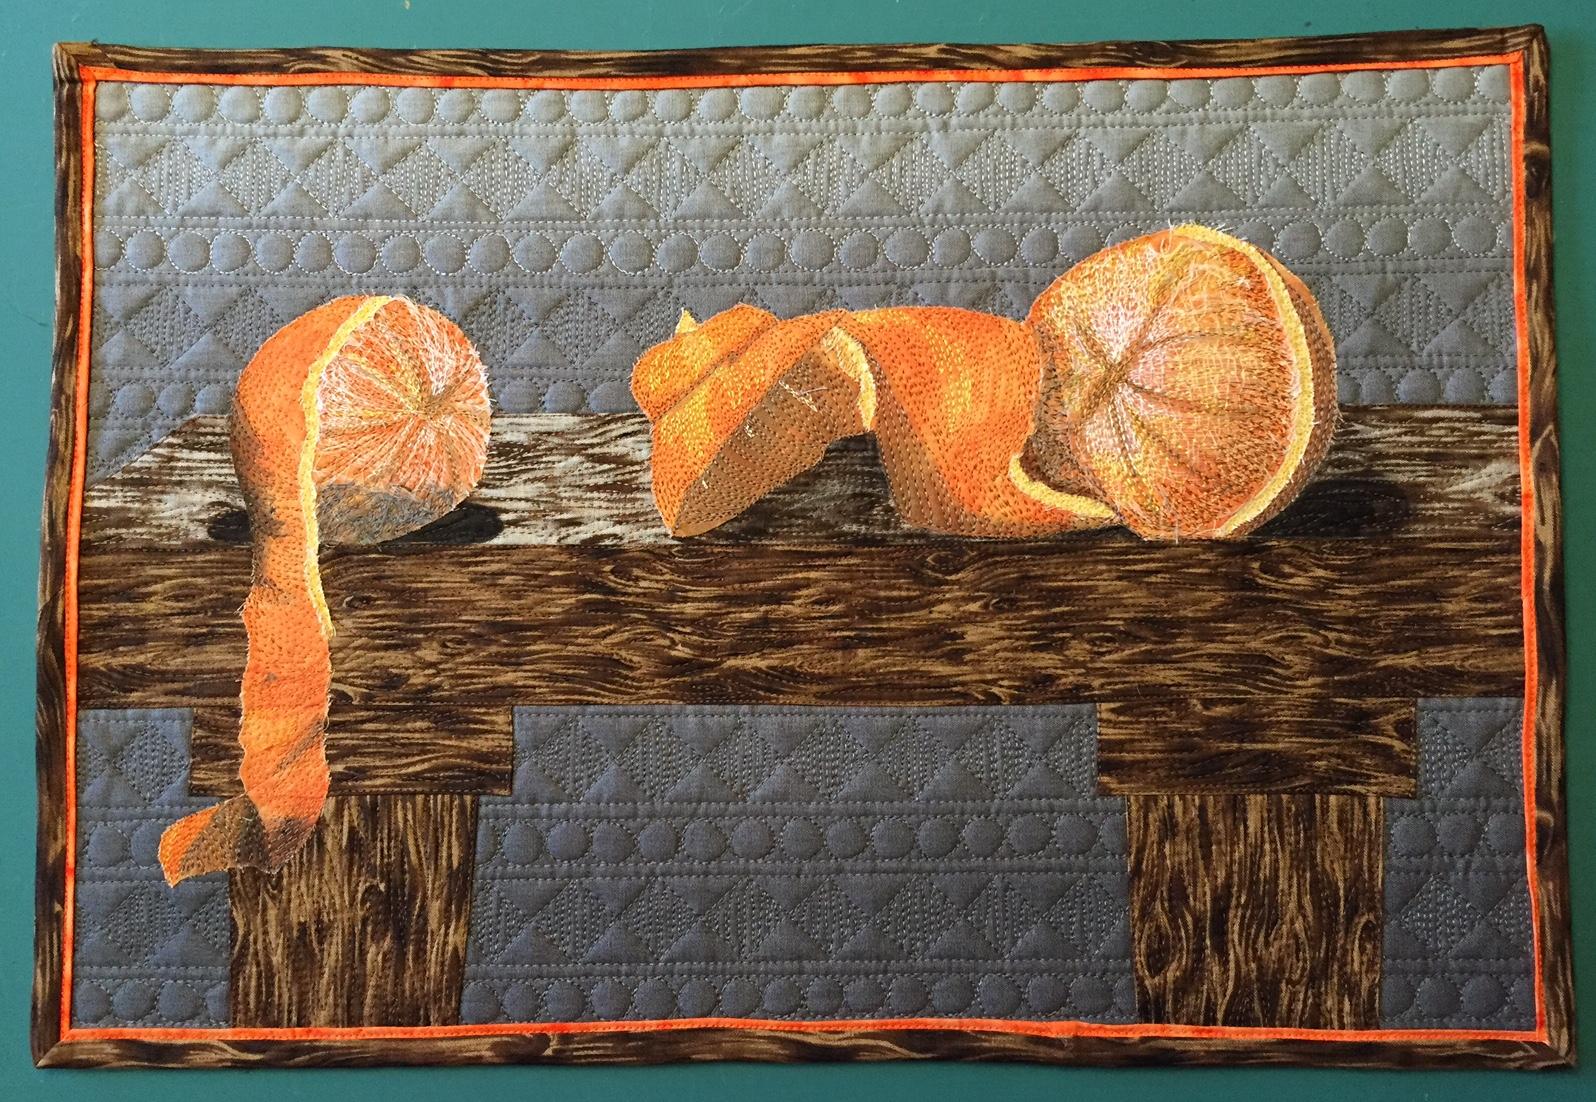 A-peeling Oranges  (2016)